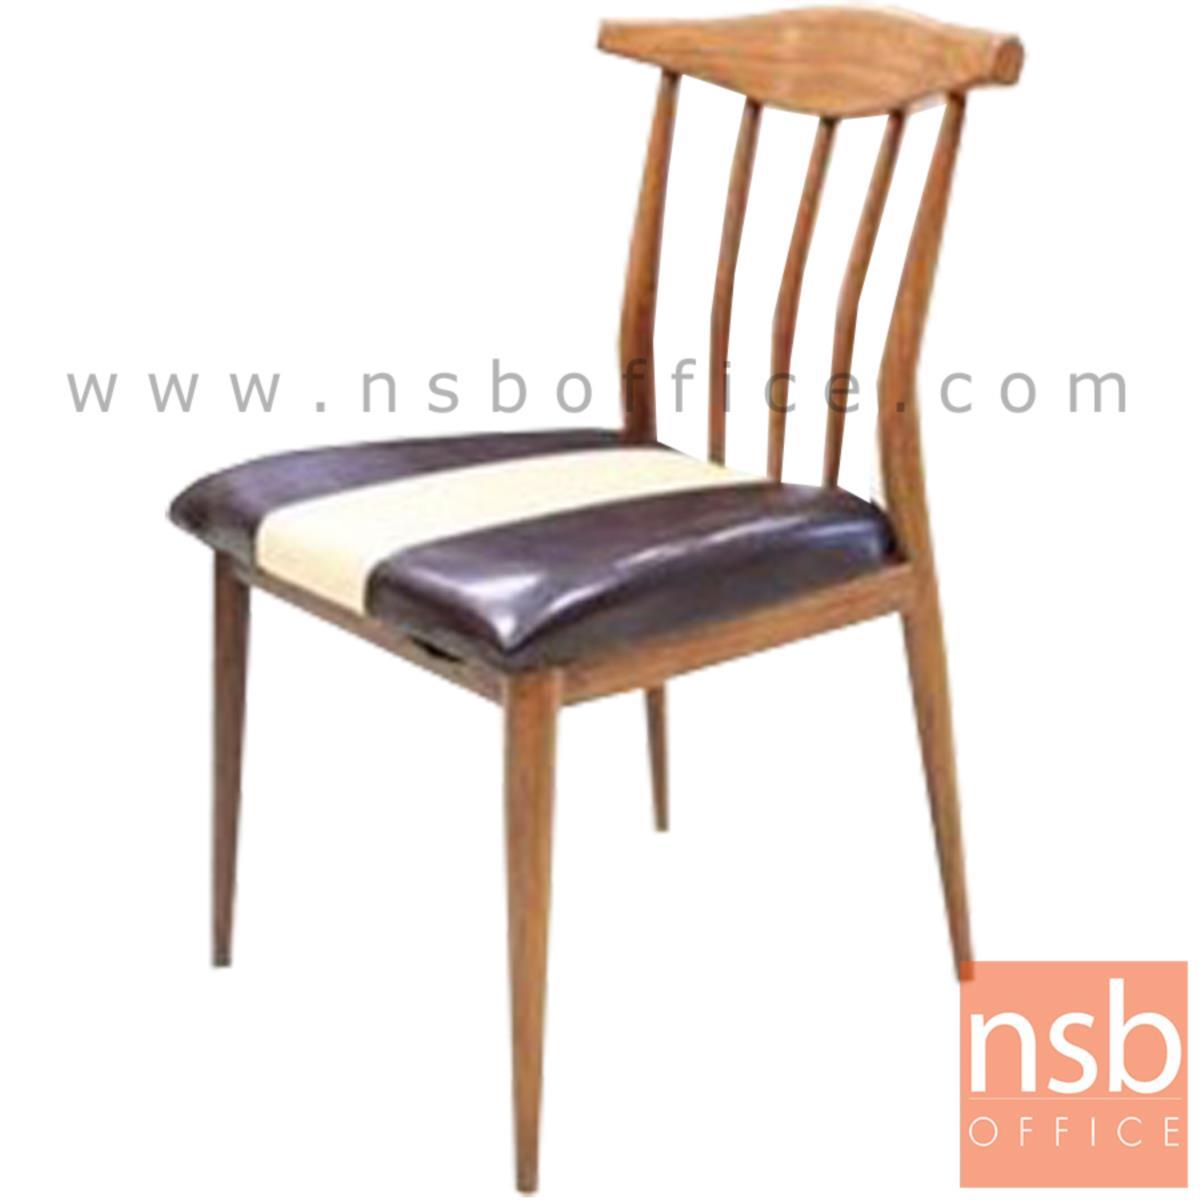 B22A177:เก้าอี้อเนกประสงค์ รุ่น MANTIS (แมนทิช) ขนาด 48W cm.